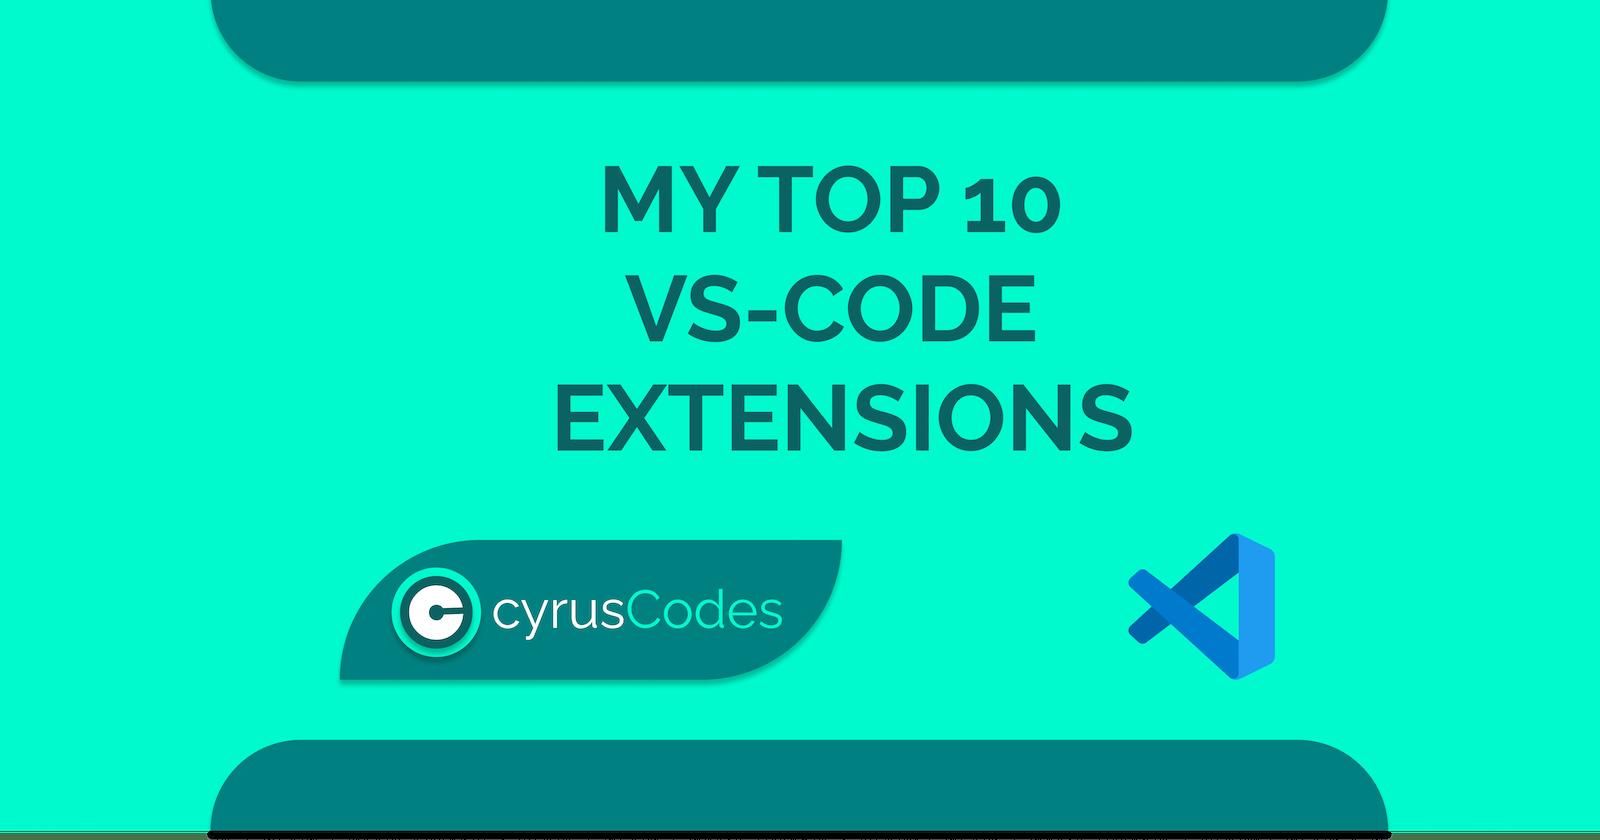 My Top 10 Vs-code Extensions